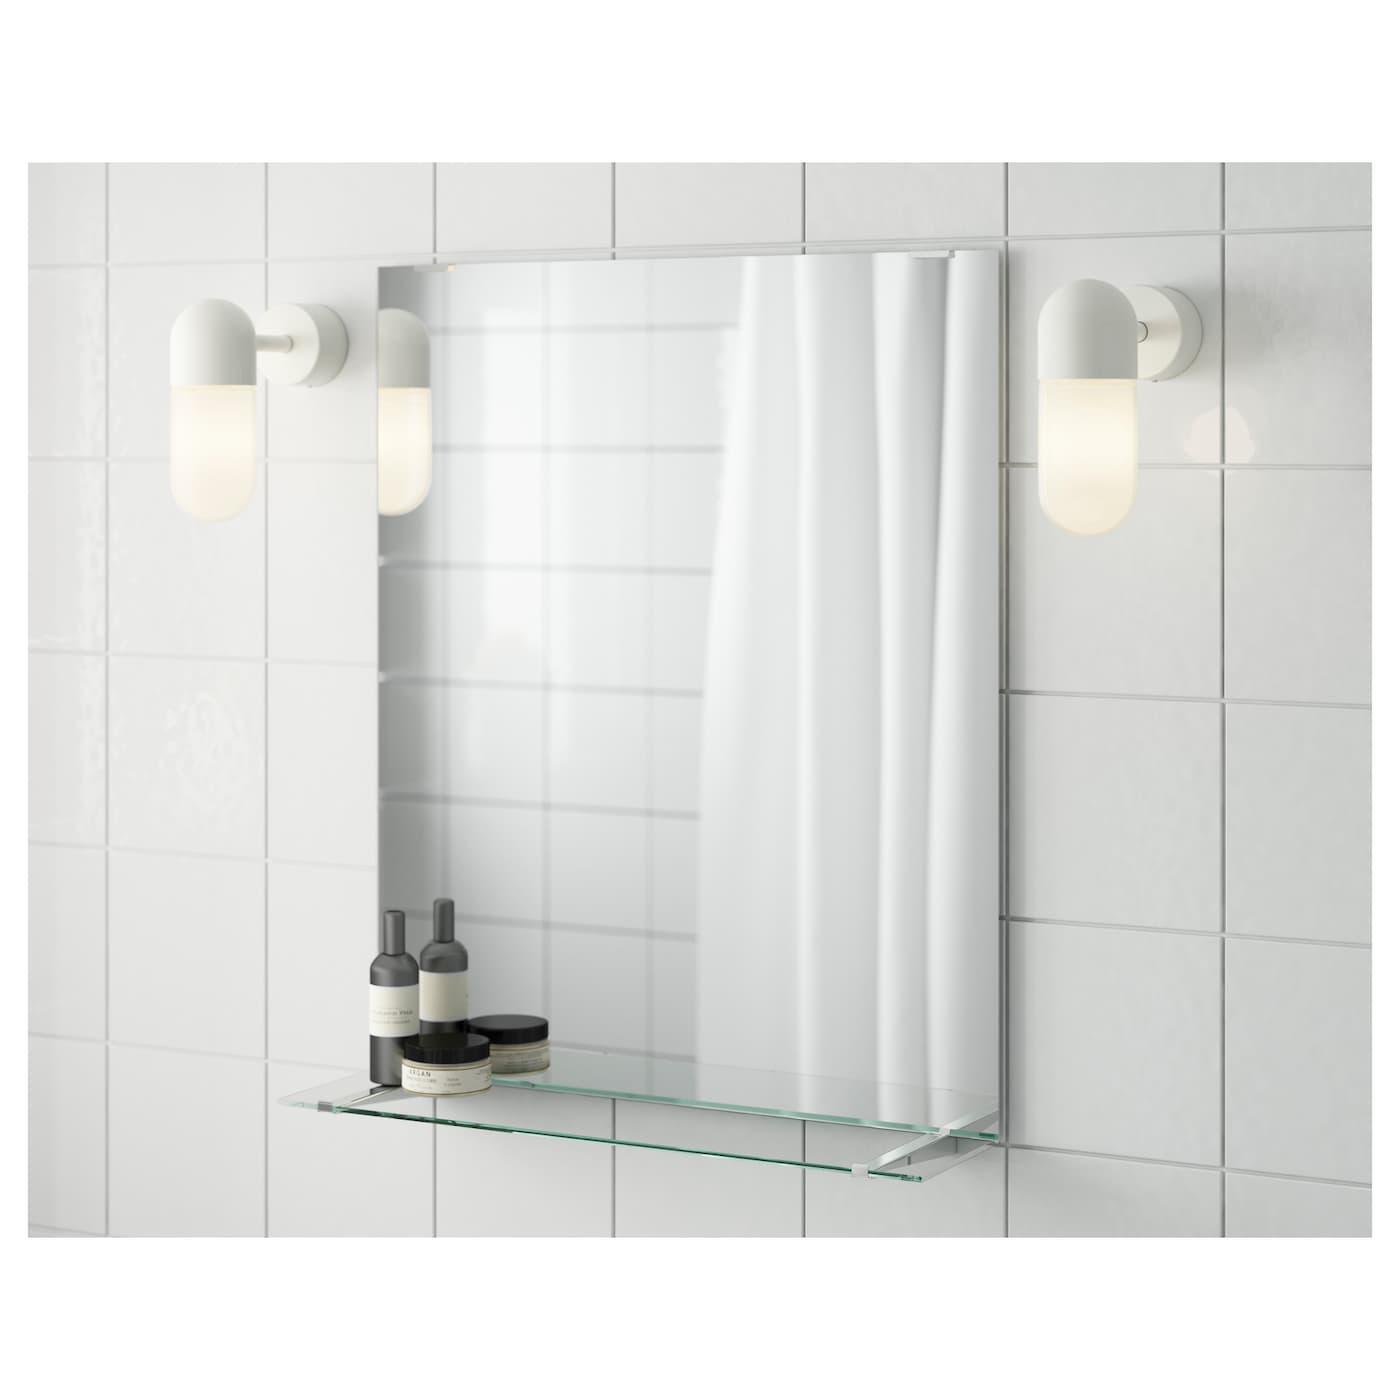 FULLEN Mirror with shelf 9x9 cm